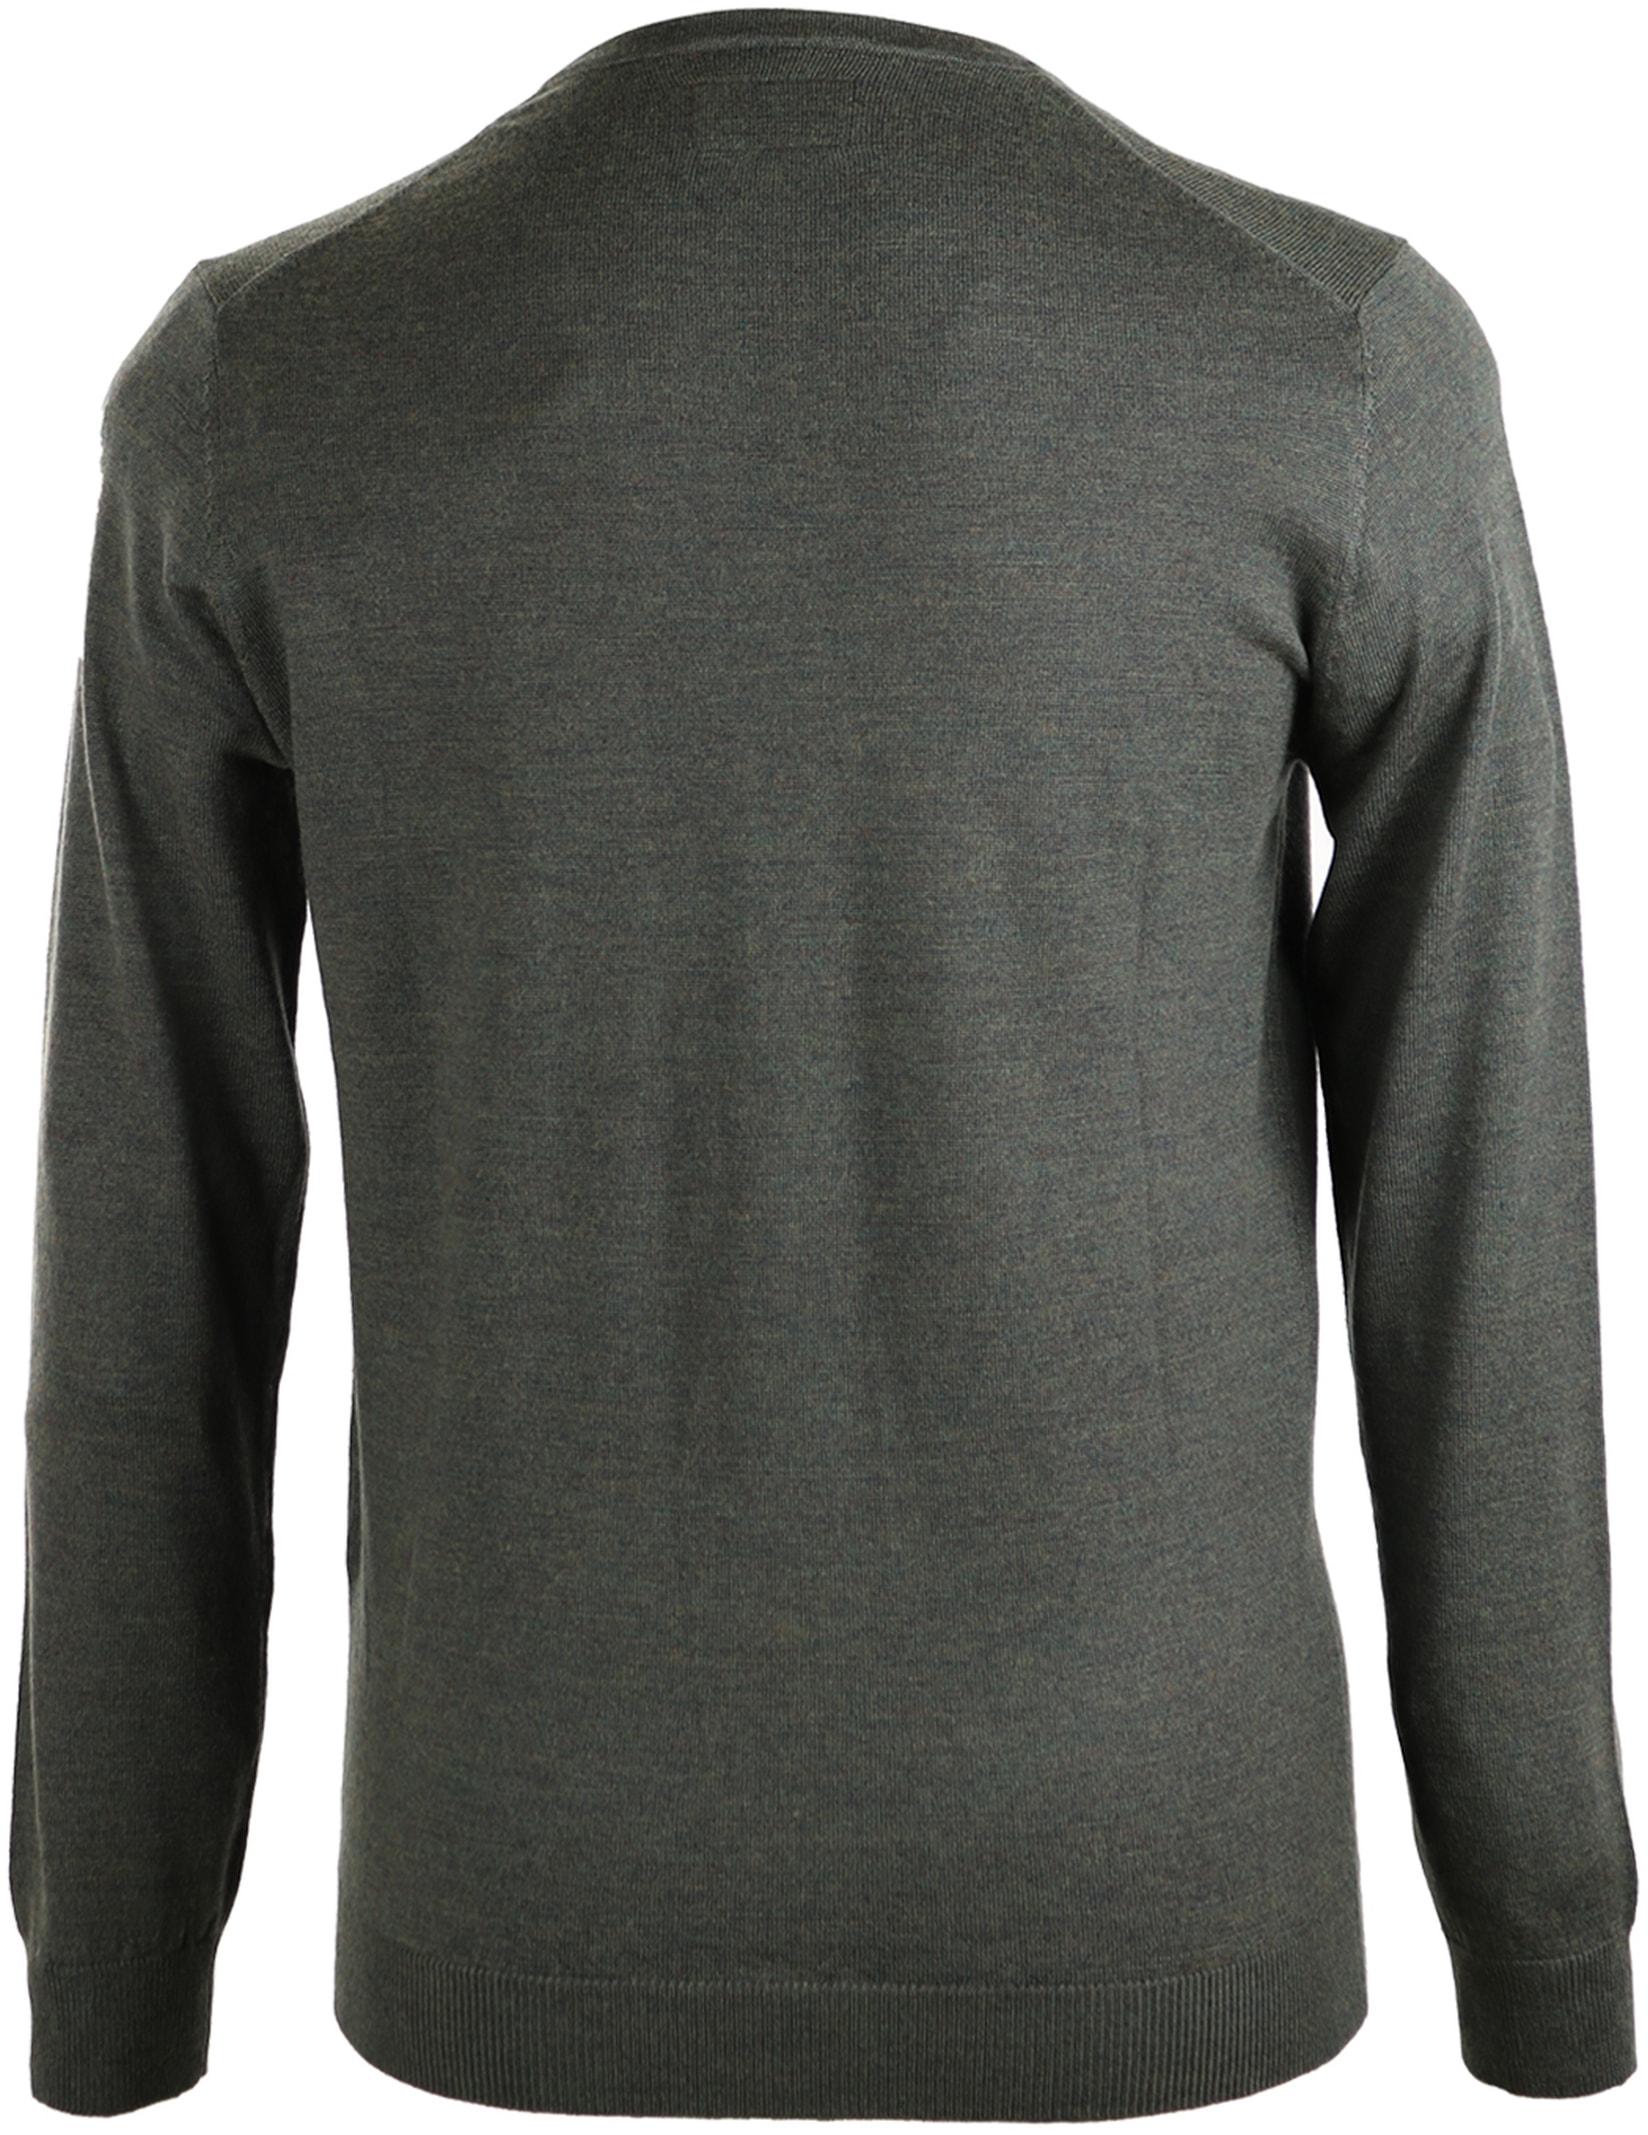 Suitable Pullover Merino Wol Donkergroen foto 1